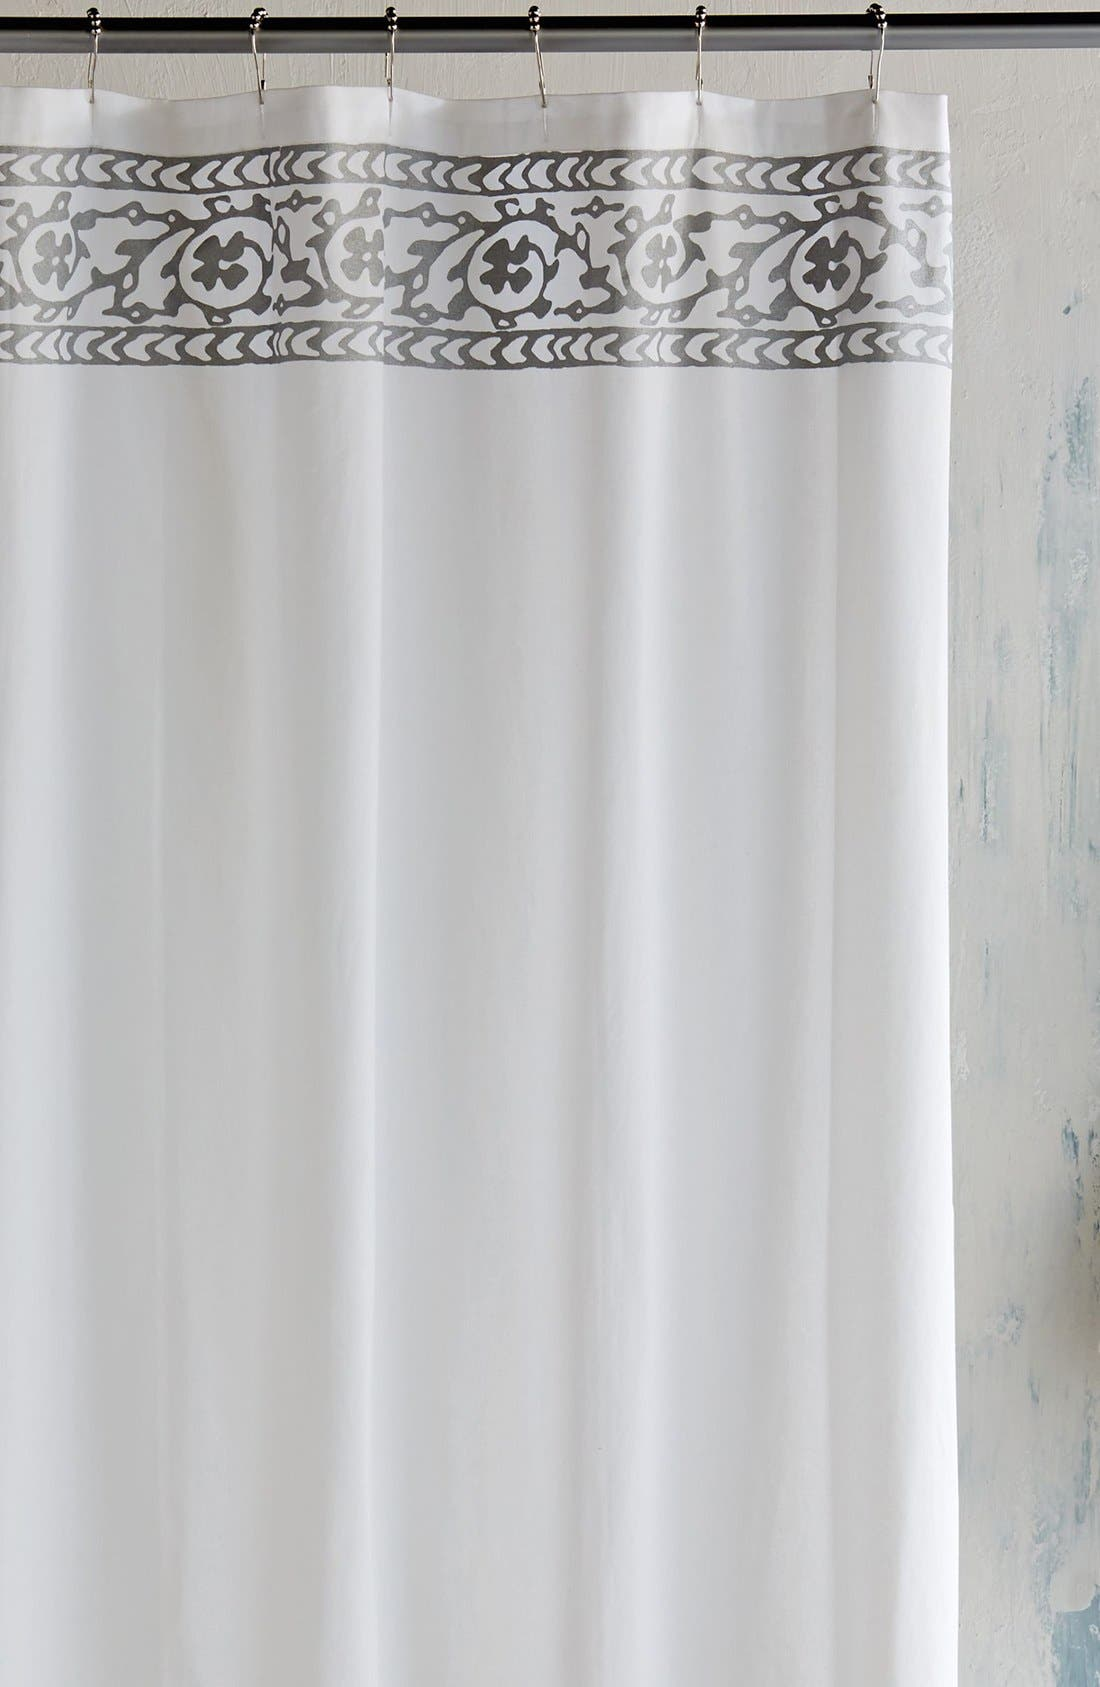 black and gray shower curtain. john robshaw \u0027jit\u0027 shower curtain black and gray